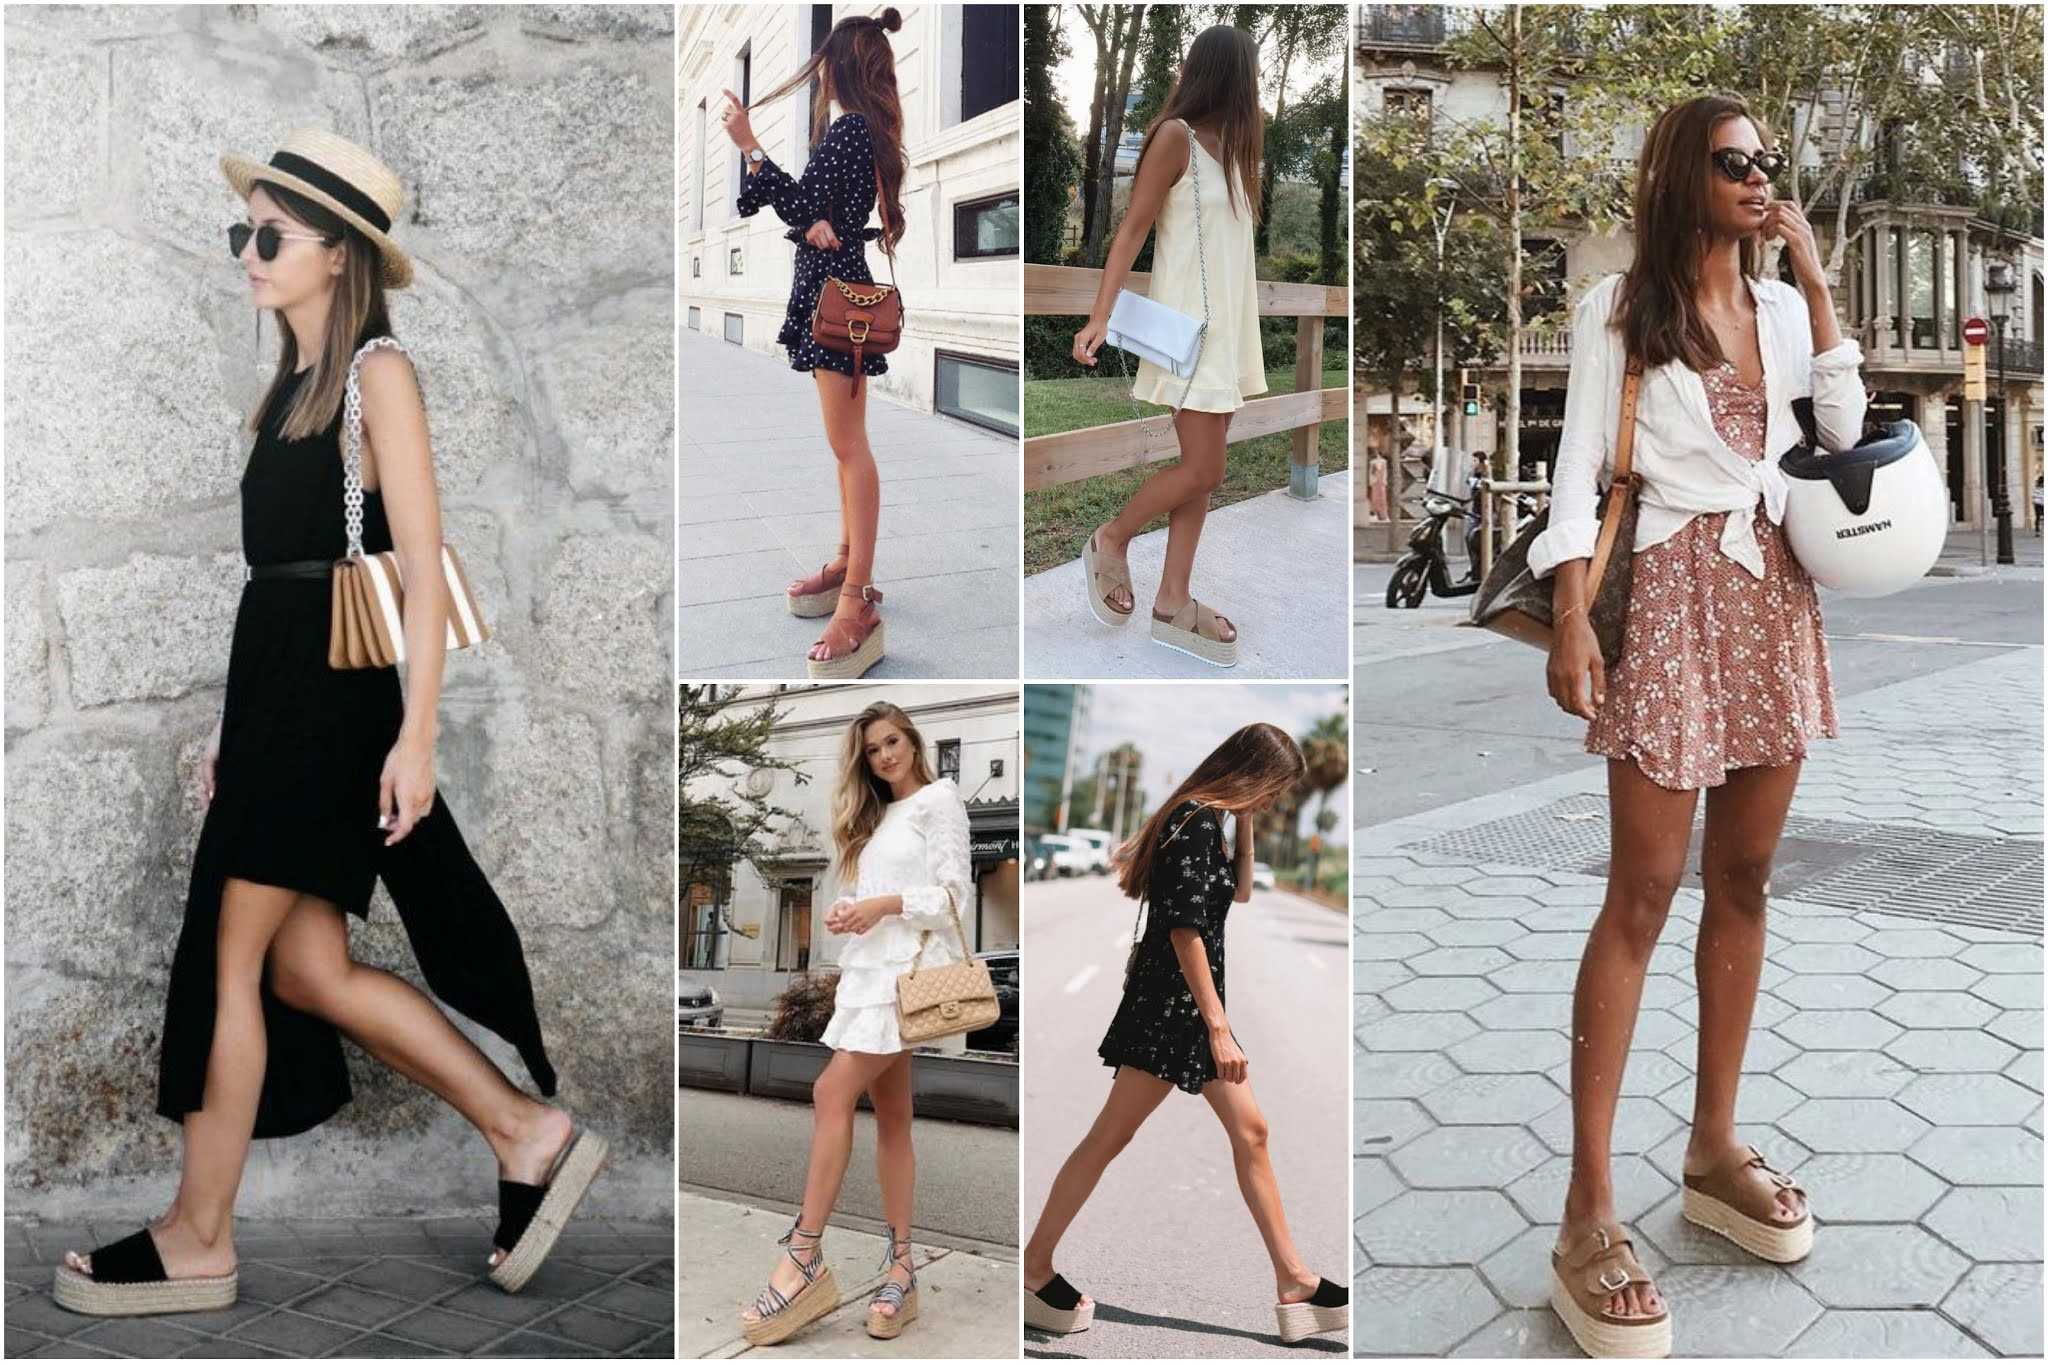 Vestido – Outfit veraniego con sandalias de plataforma